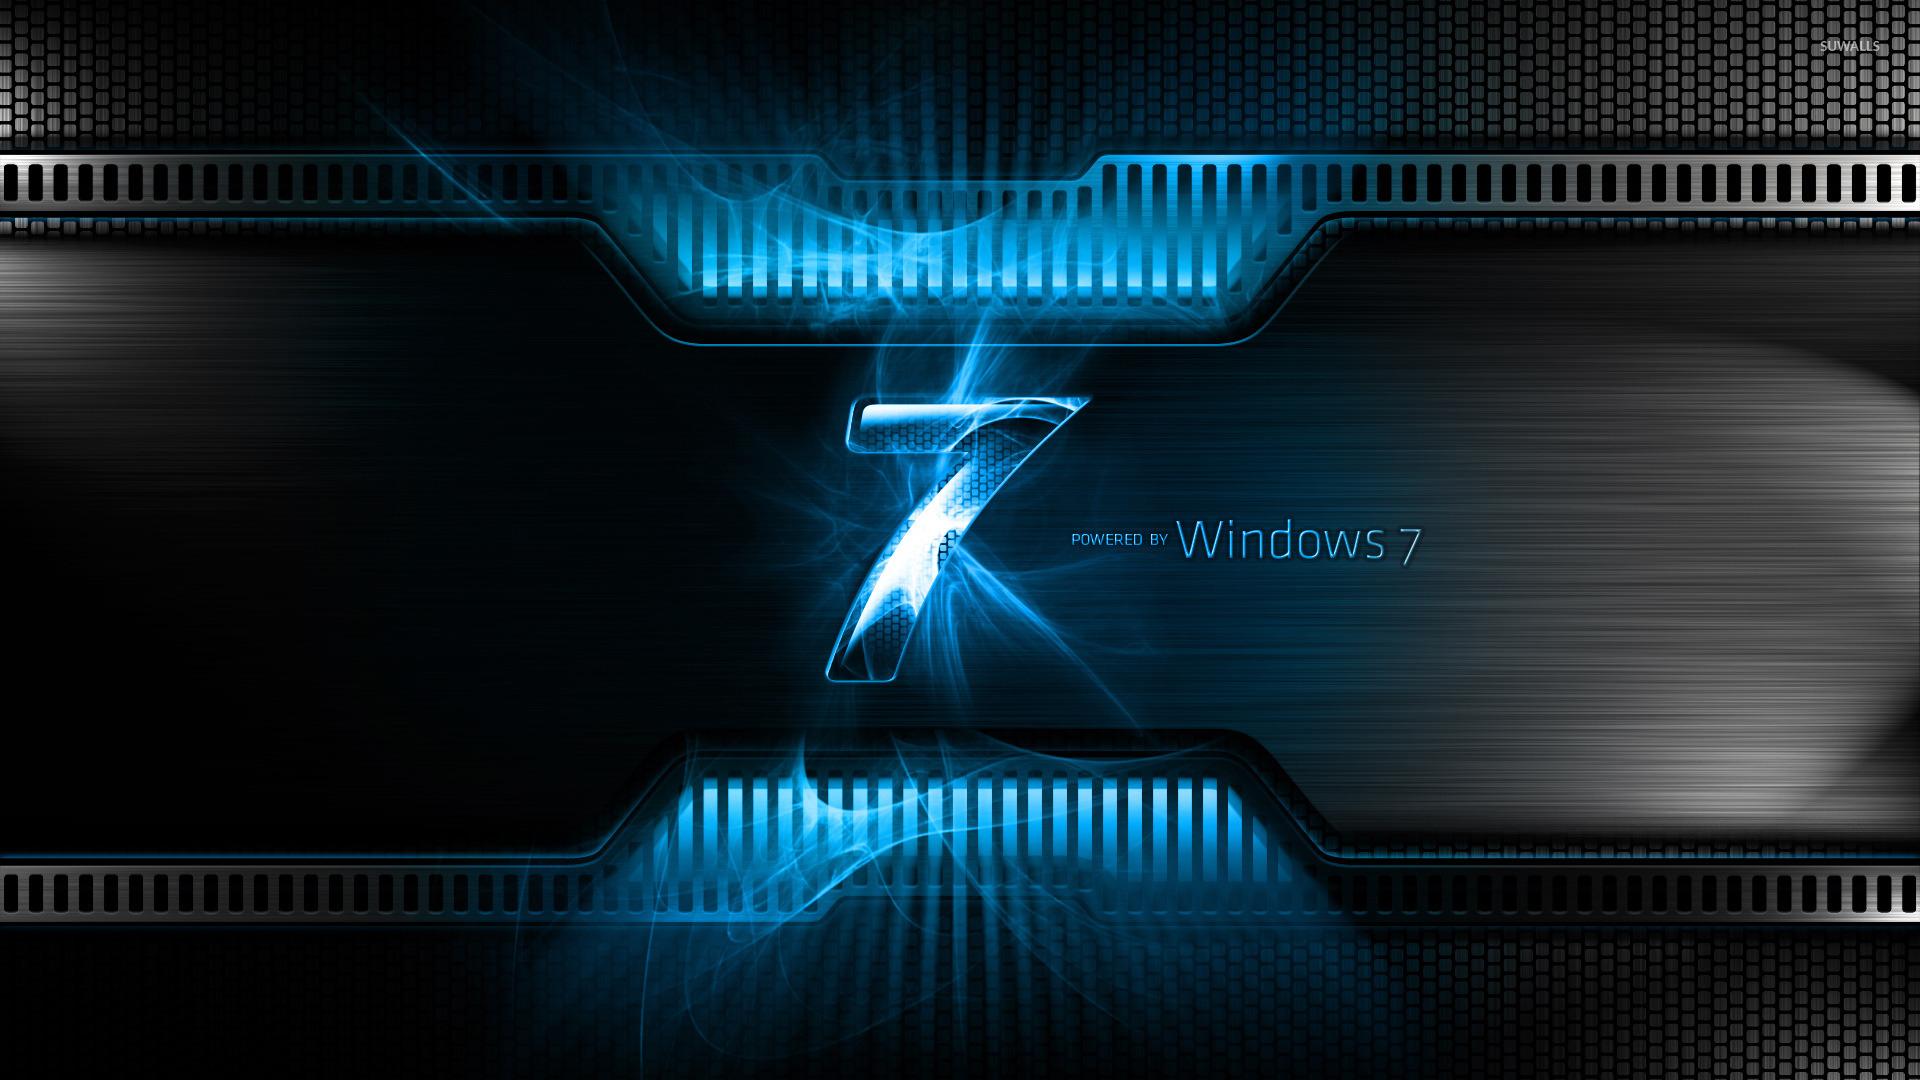 Windows 7 Wallpaper